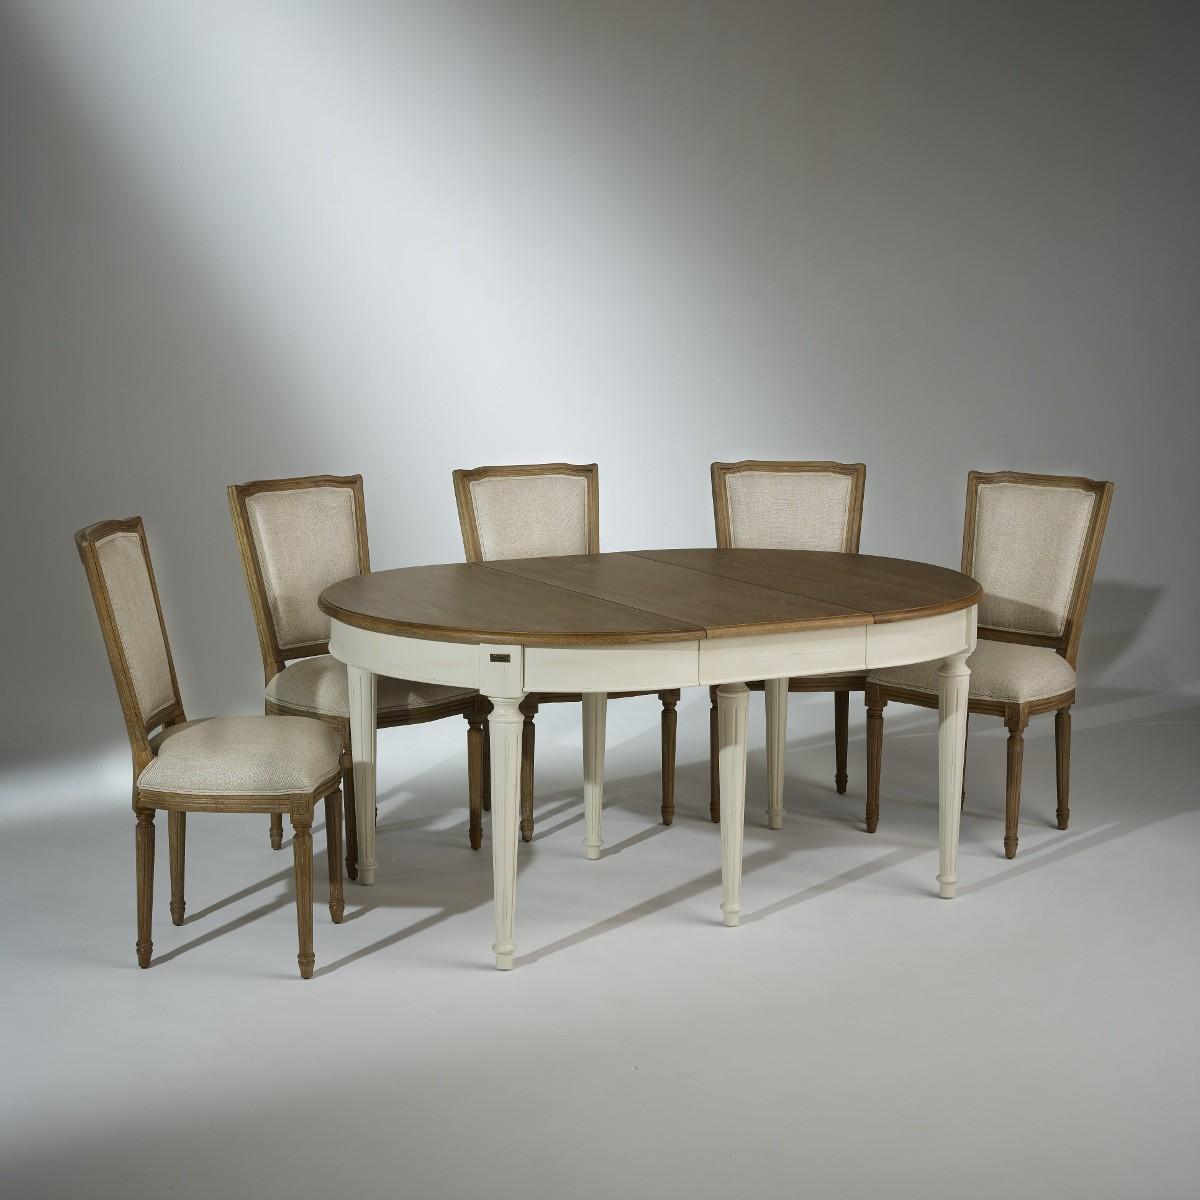 Ensemble table de salle manger florence et 6 chaises marie antoinette - Ensemble salle a manger ...